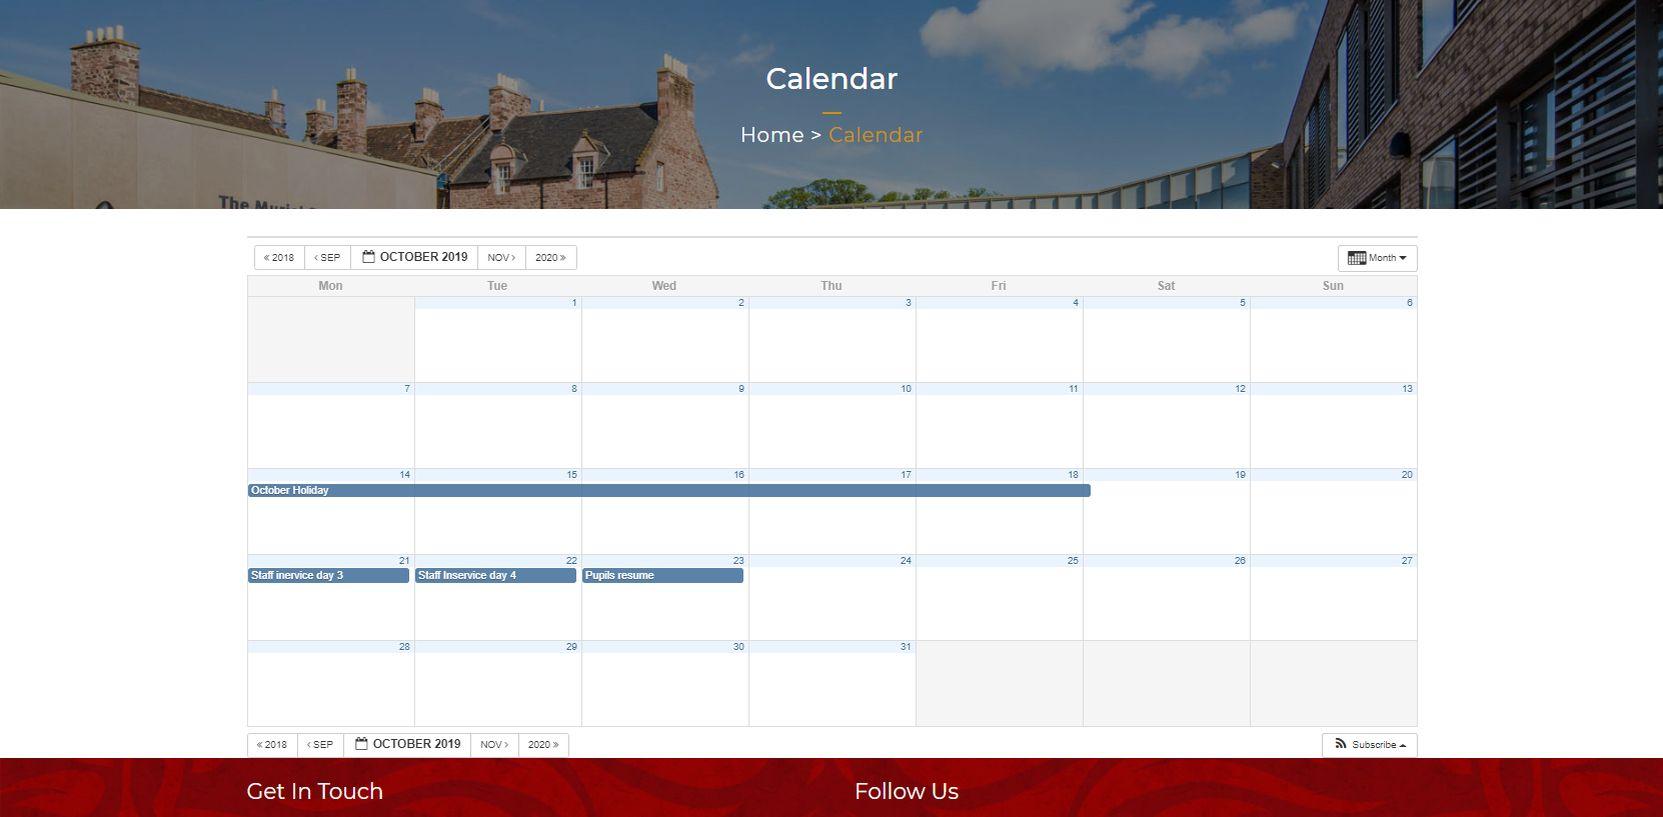 James Gillespie's High School Calendar